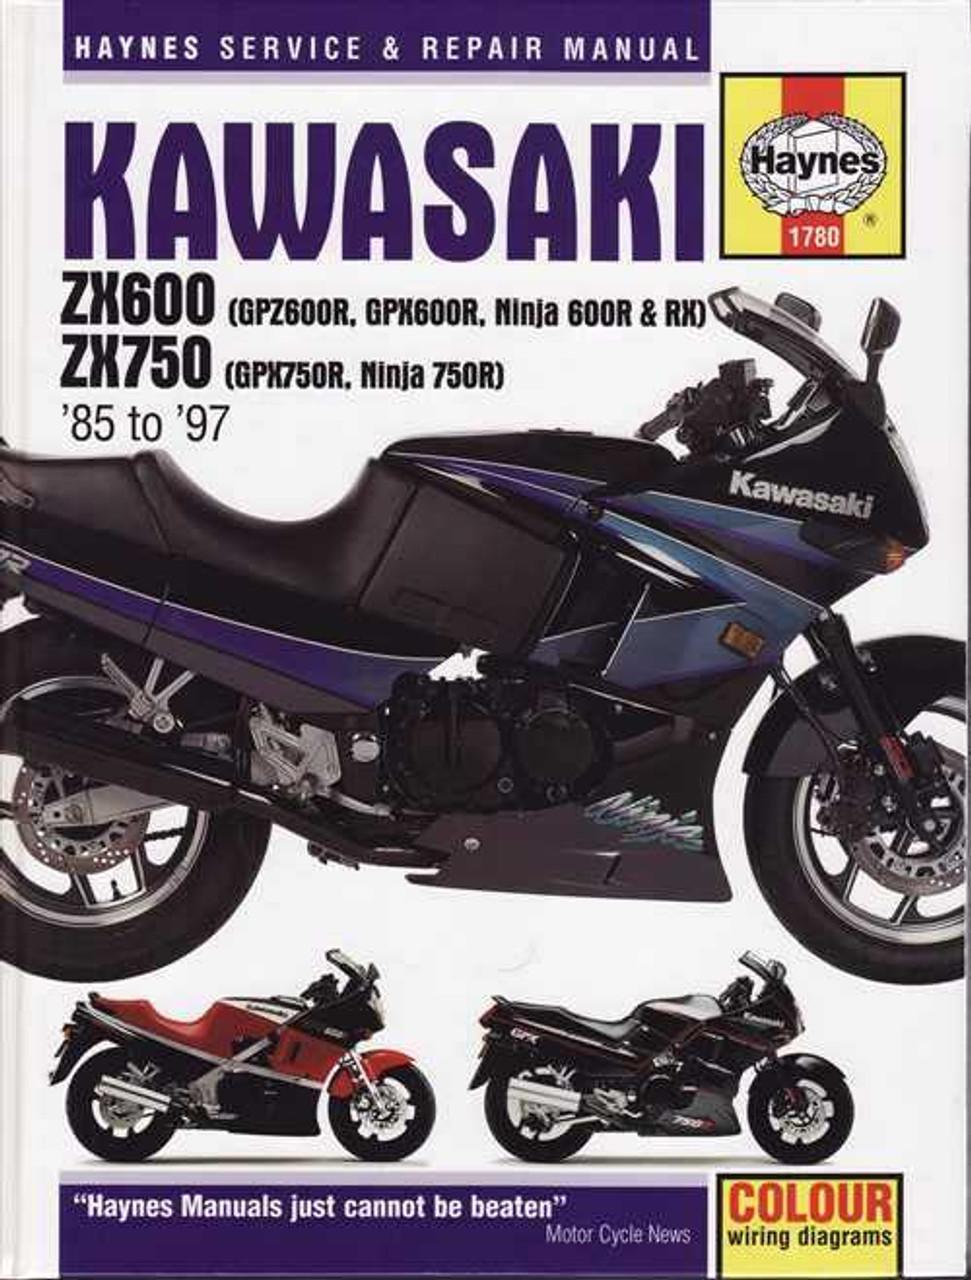 kawasaki zx600 zx750 1985 1997 workshop manual rh automotobookshop com au